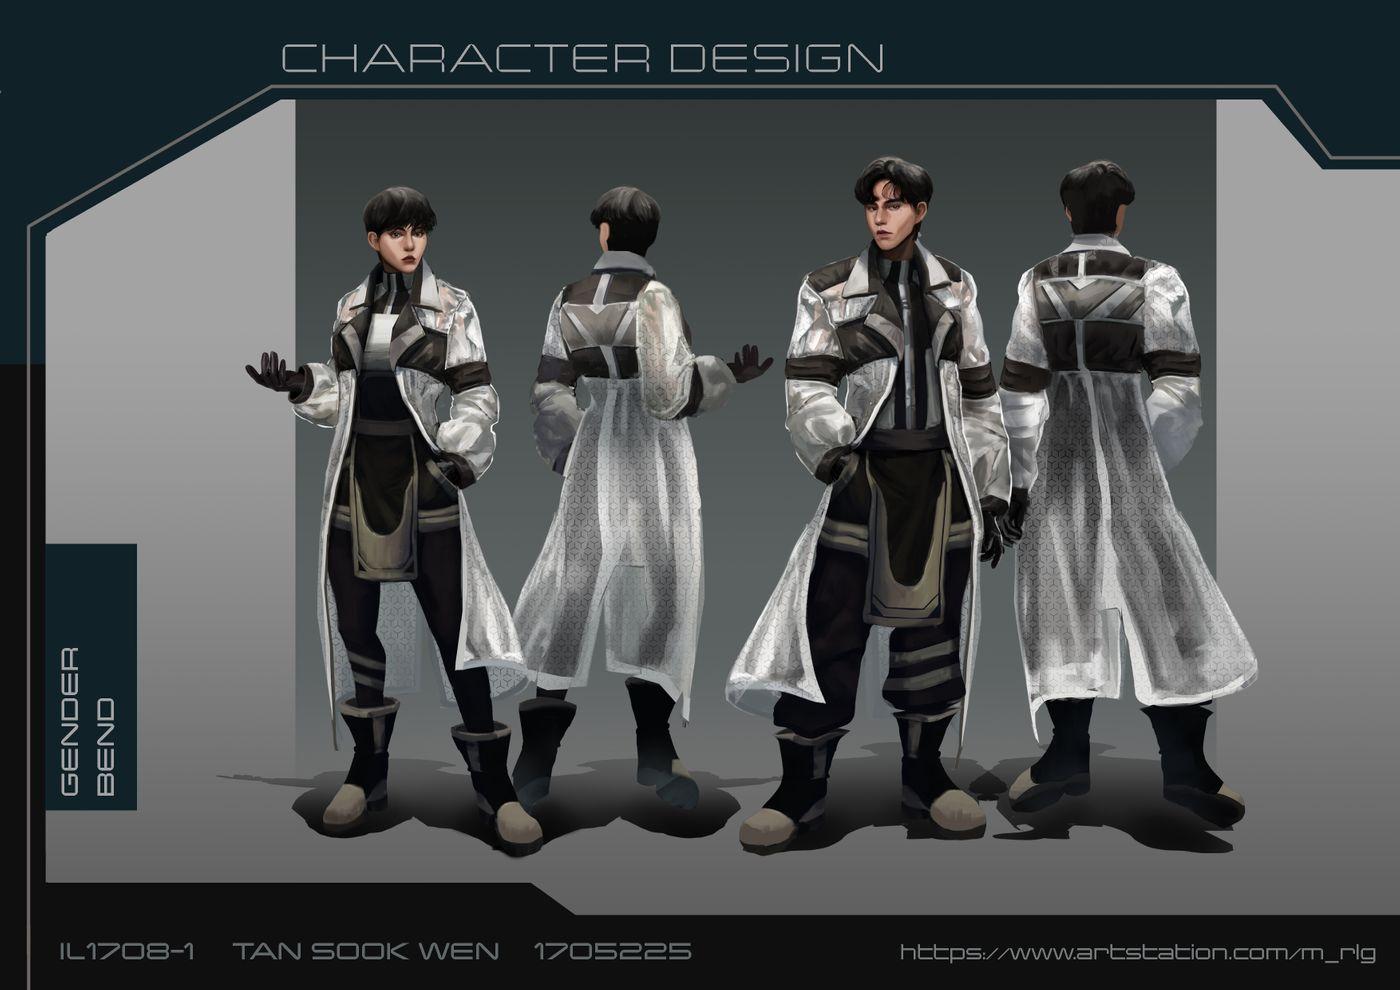 Tan Sook Wen Presentation3 Mrlg